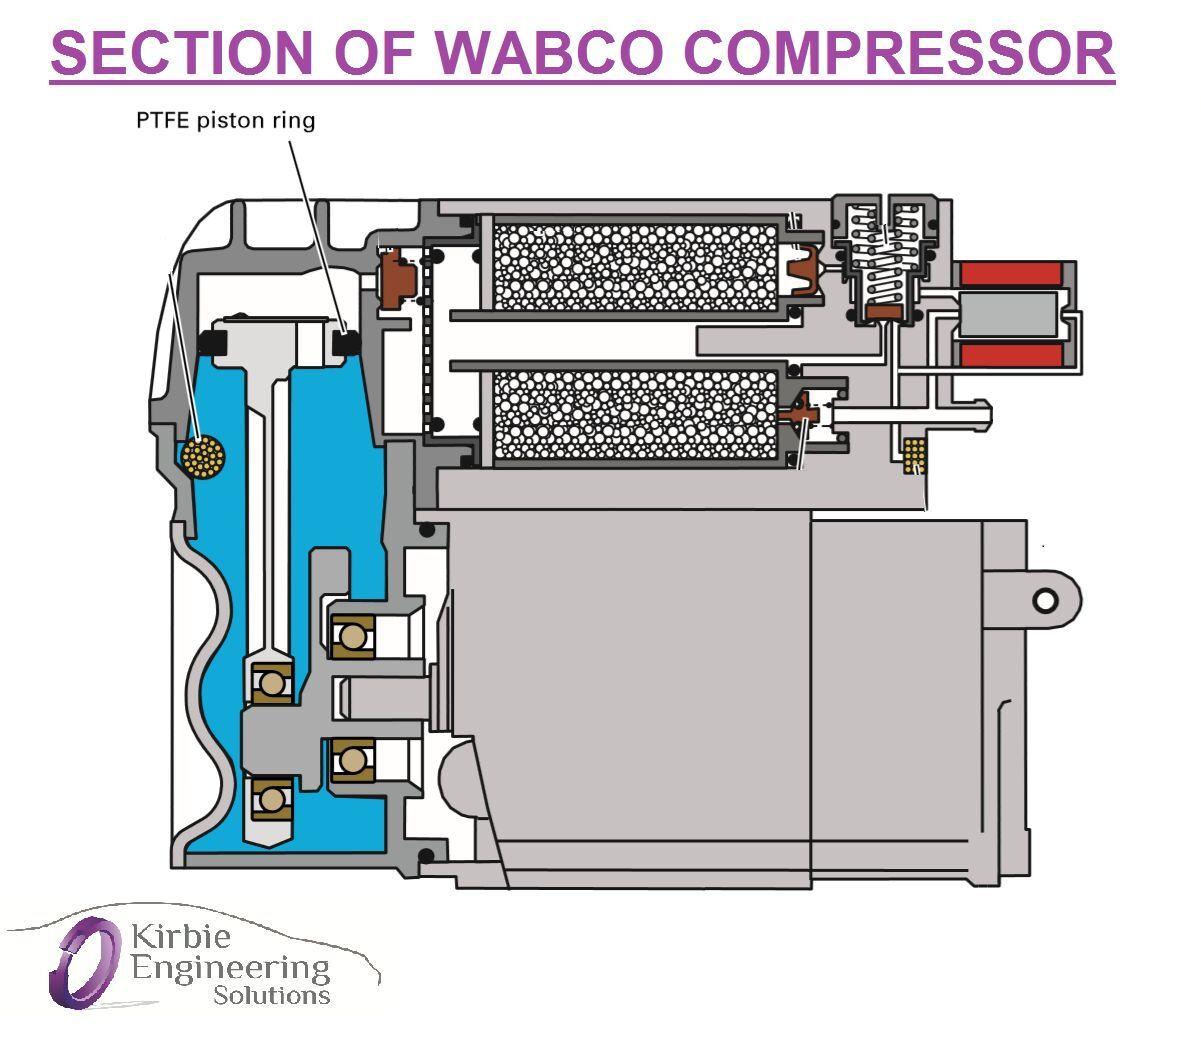 Wabco Air Suspension Wiring Diagram Worksheet And E39 Abs Bmw X5 E53 5 Series Compressor Pump Seal Rh Picclick Co Uk International Tractor Vcs Ii